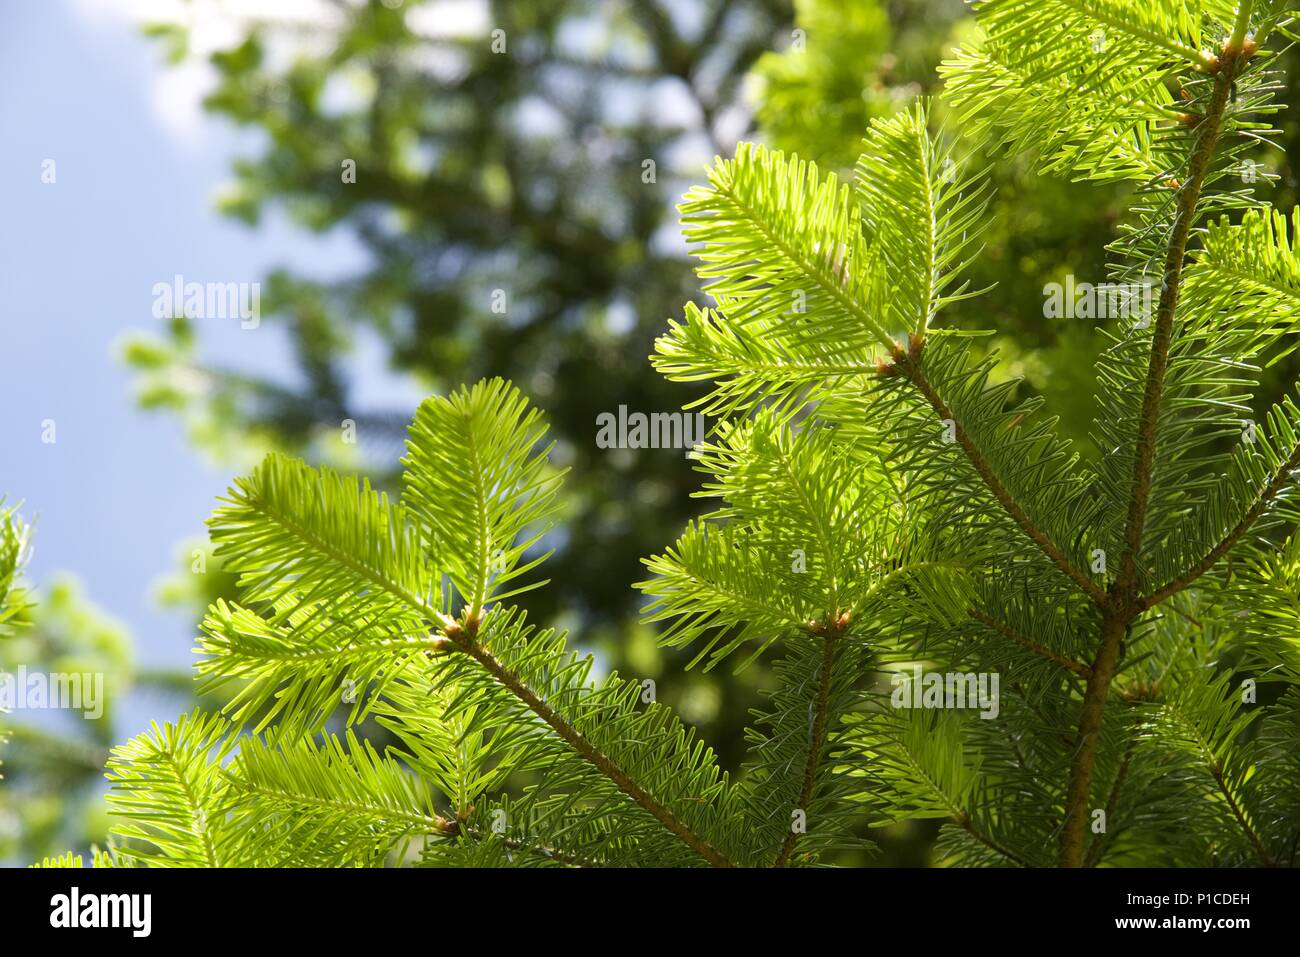 Douglas Fir (Pseudotsuga menziesii): new growth on a mature Douglas fir, or Oregon Pine tree Stock Photo